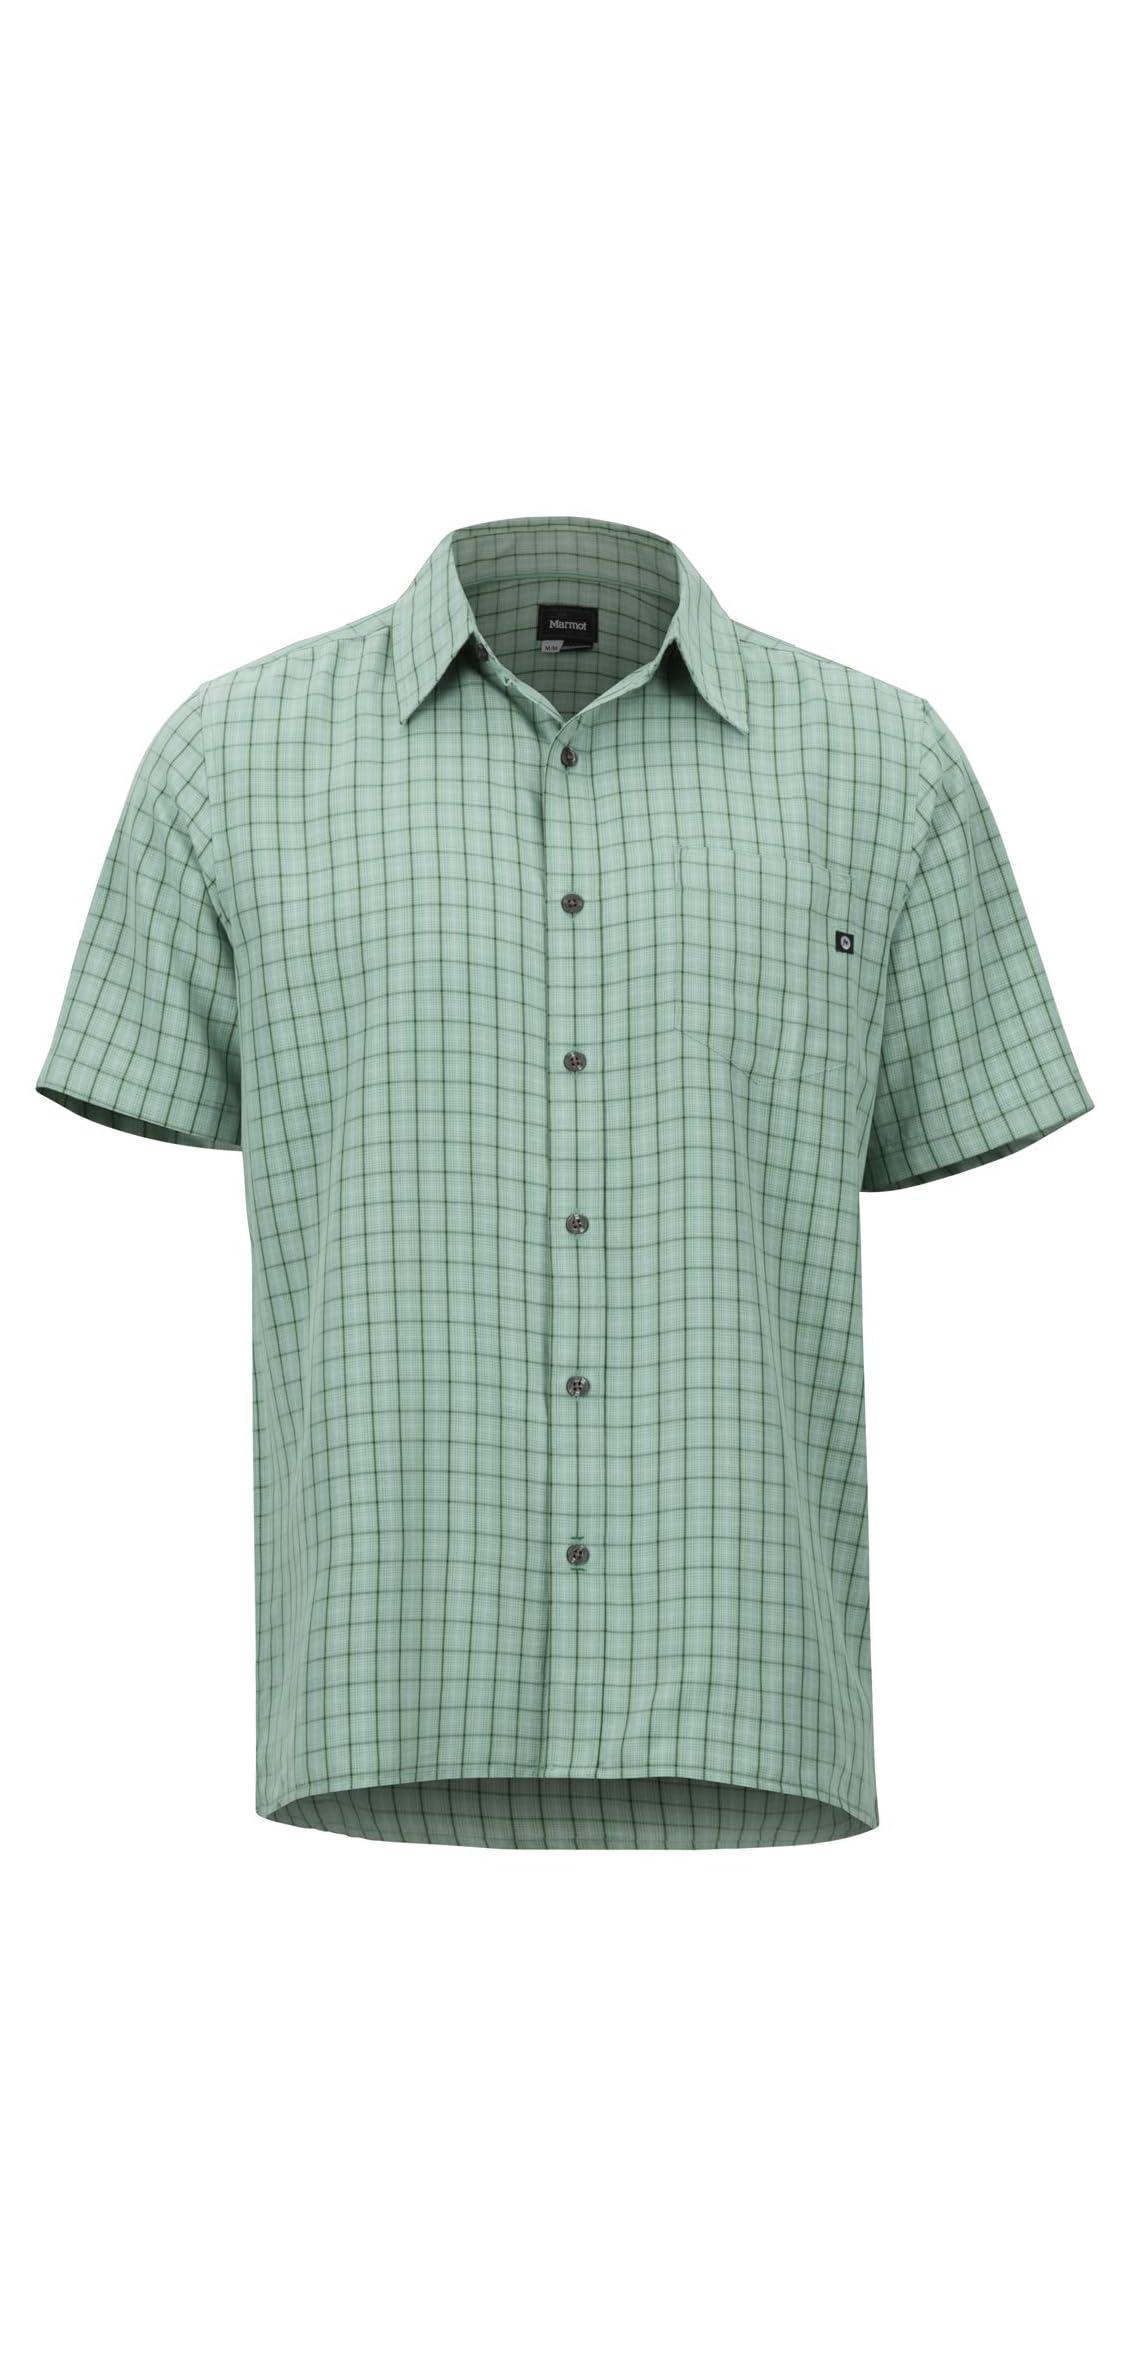 Eldridge Short Sleeve Shirt - Men's